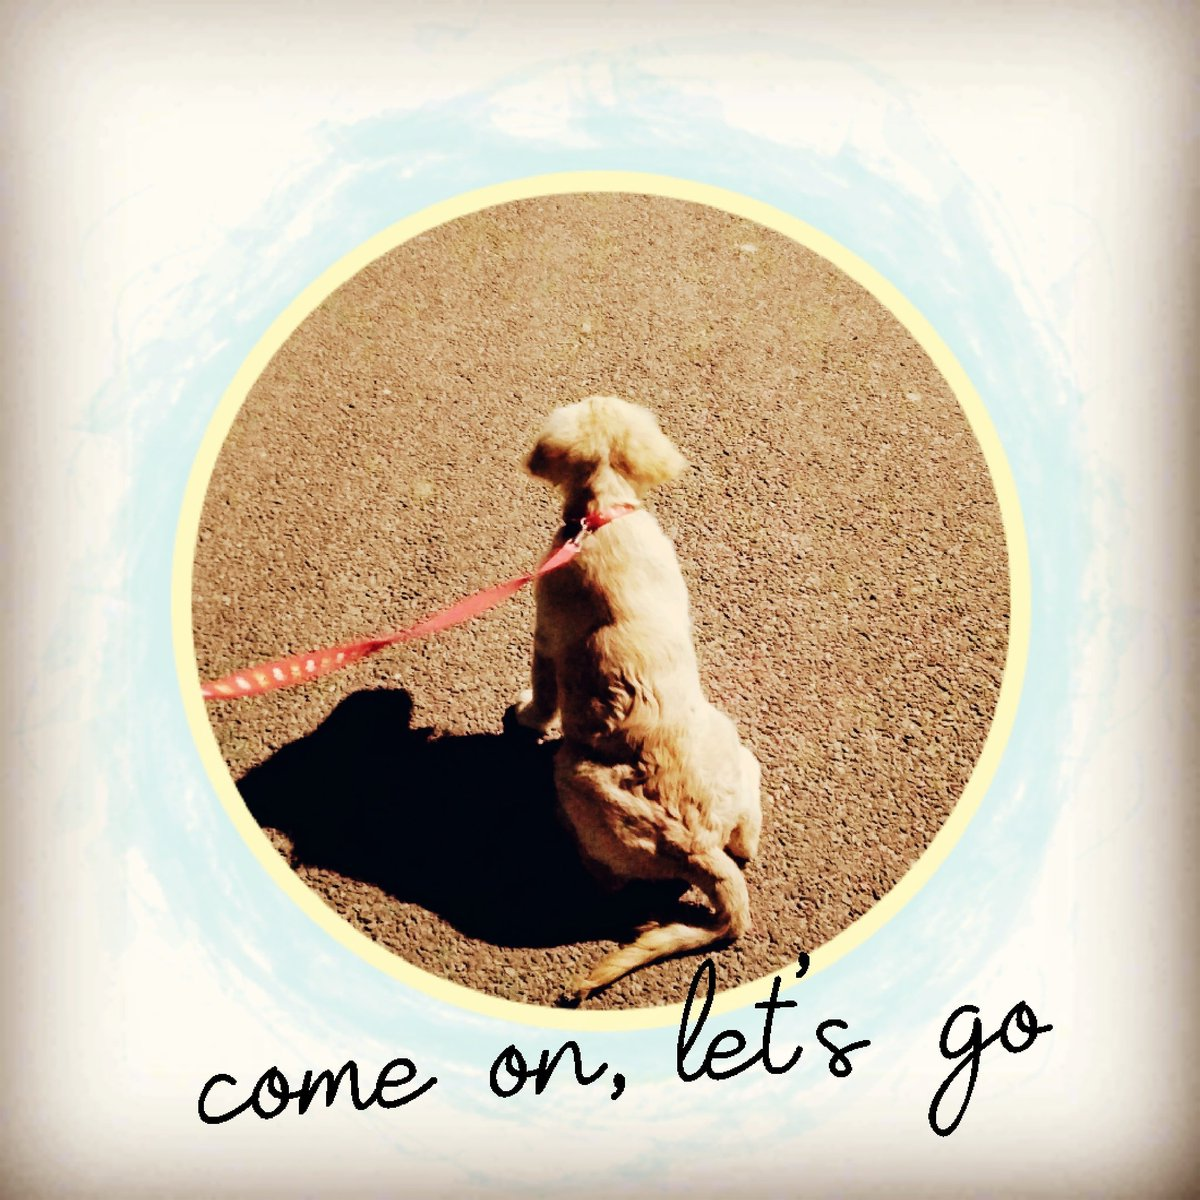 https://instagram.com/babysimba000?igshid=ttvm9i8uim1y… #goldenretriever #ArmyBra #QuarantineLife #puppylove #playtime #woofwoof #dogsofinstagram #SimbaaBaby #Dogsotwitter #puppylove #puppylife #dogoftheday  #ilovemydog #barkingdivas #doglove #dogsitting #dogsmile #pawsitivevibes #goldenretrieverpuppyspic.twitter.com/lzJ6b3qdjm